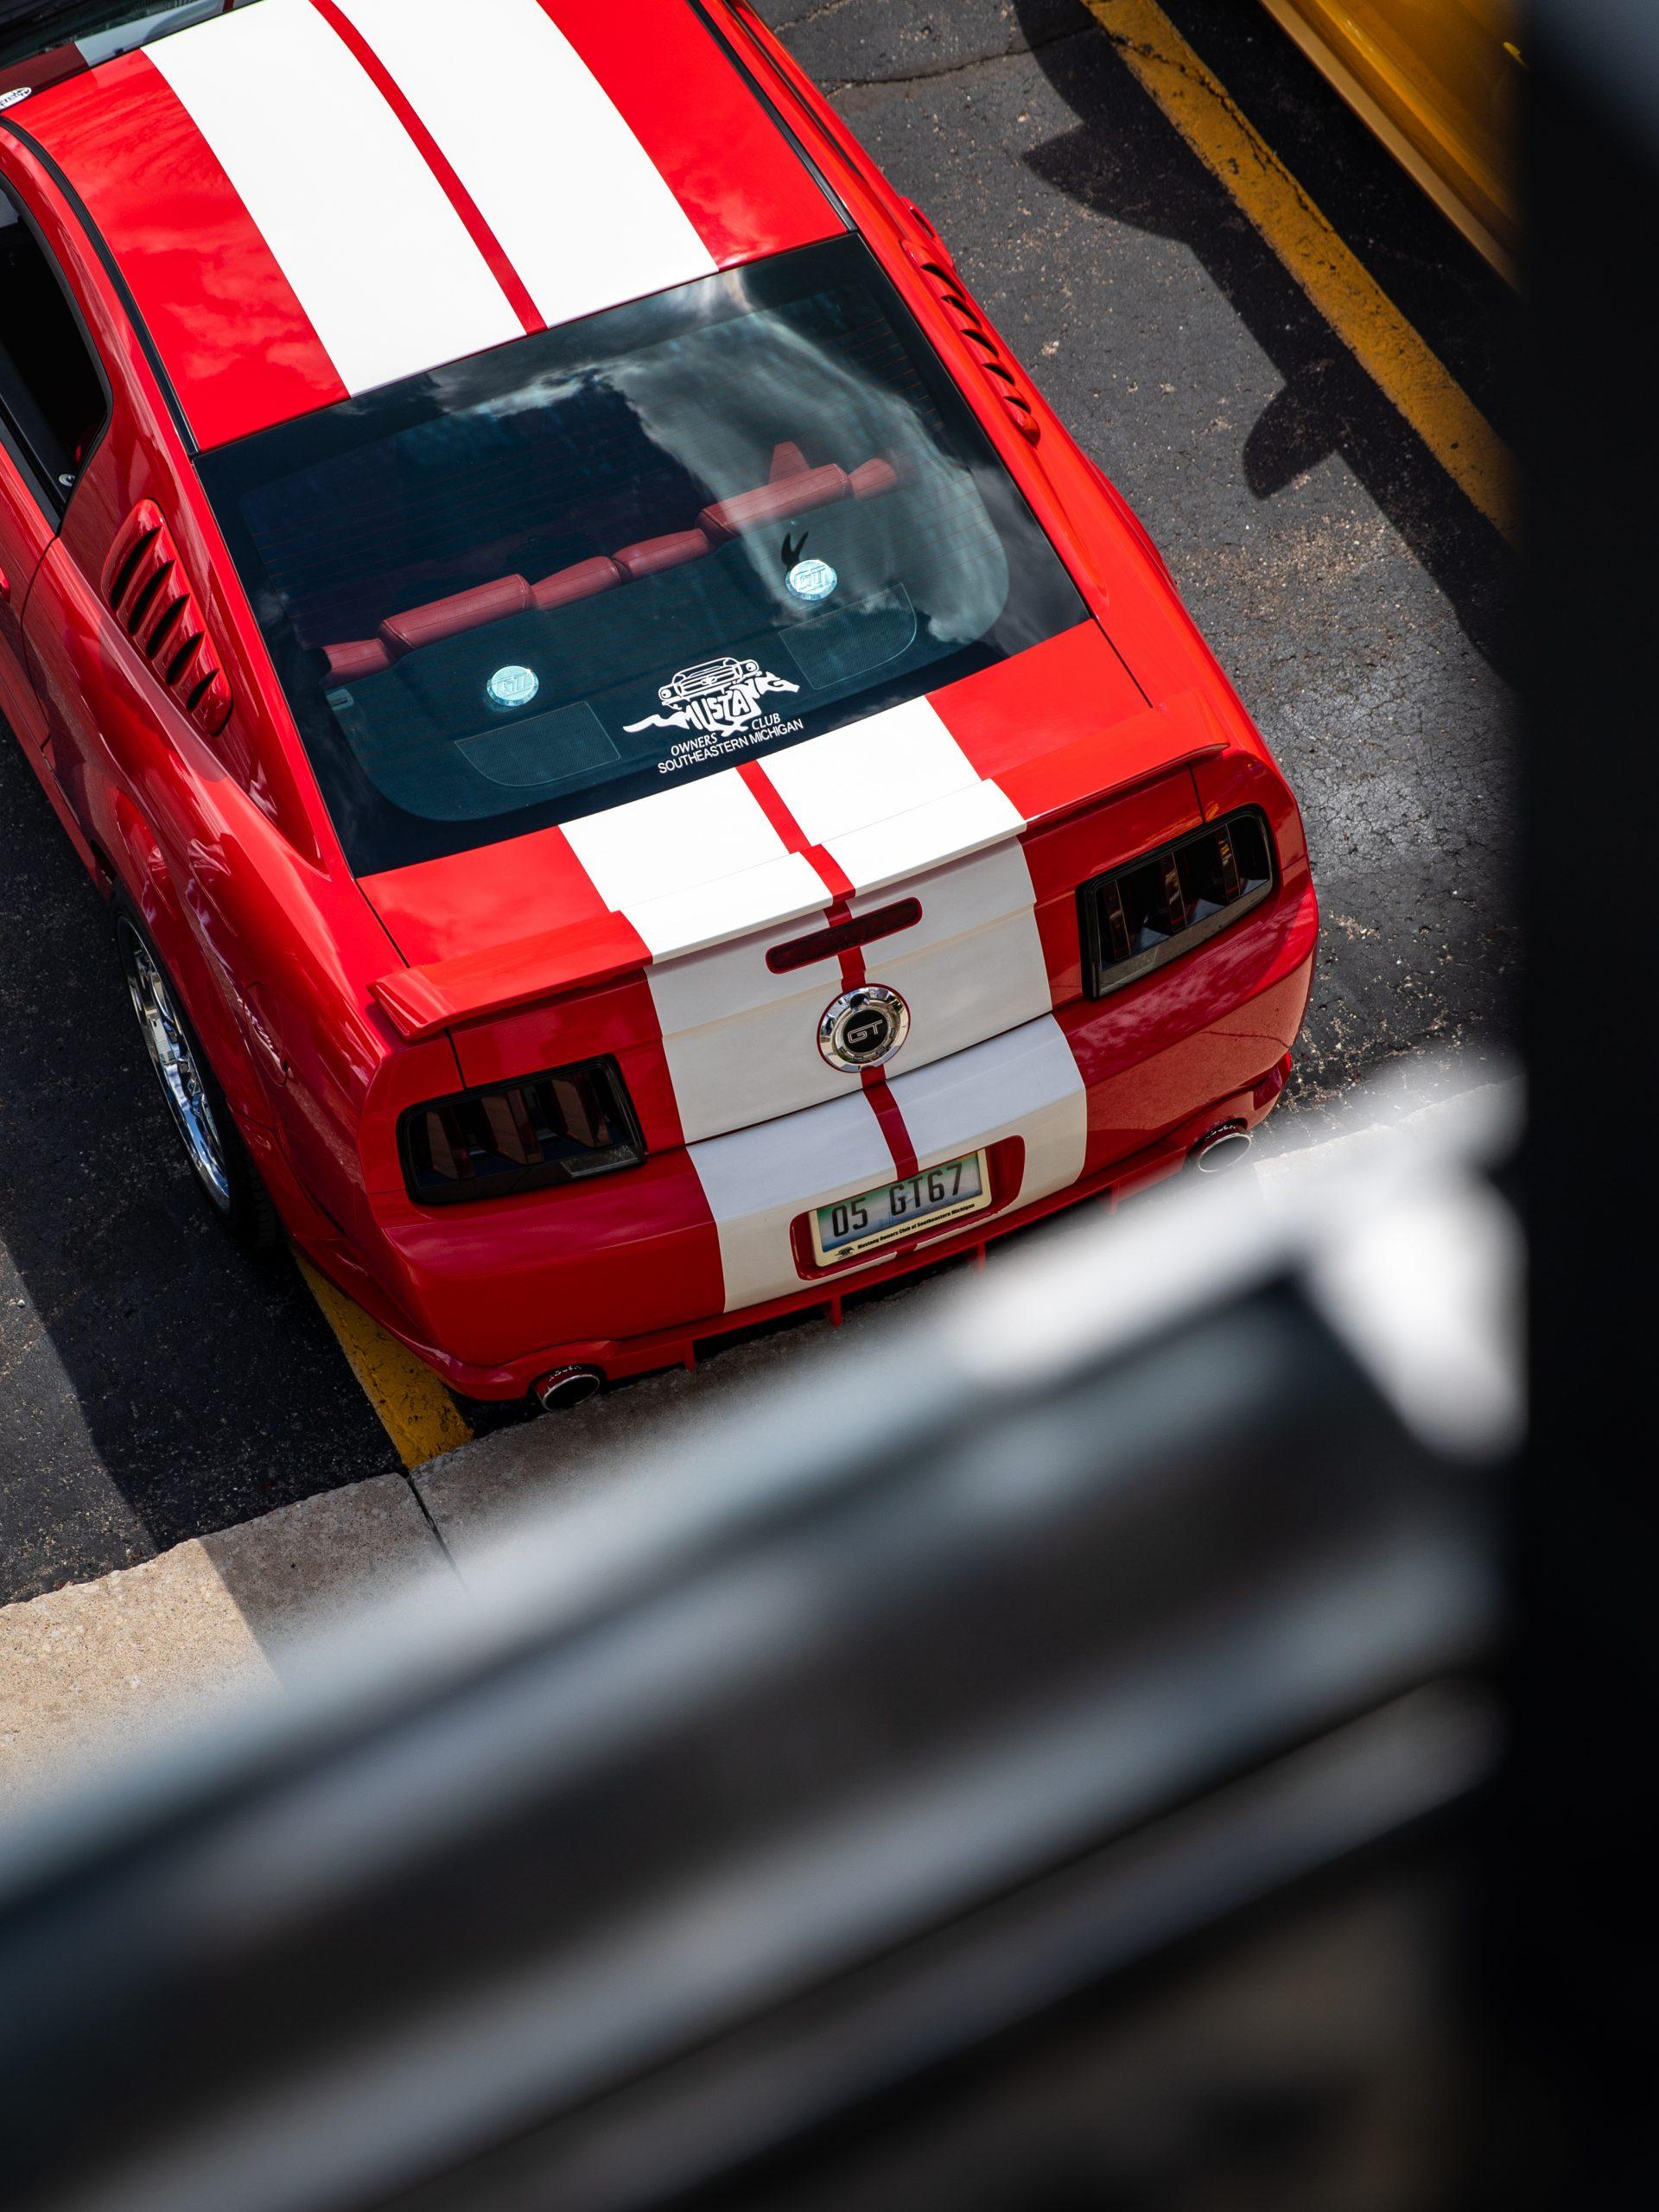 Mustang Week parking lot overhead